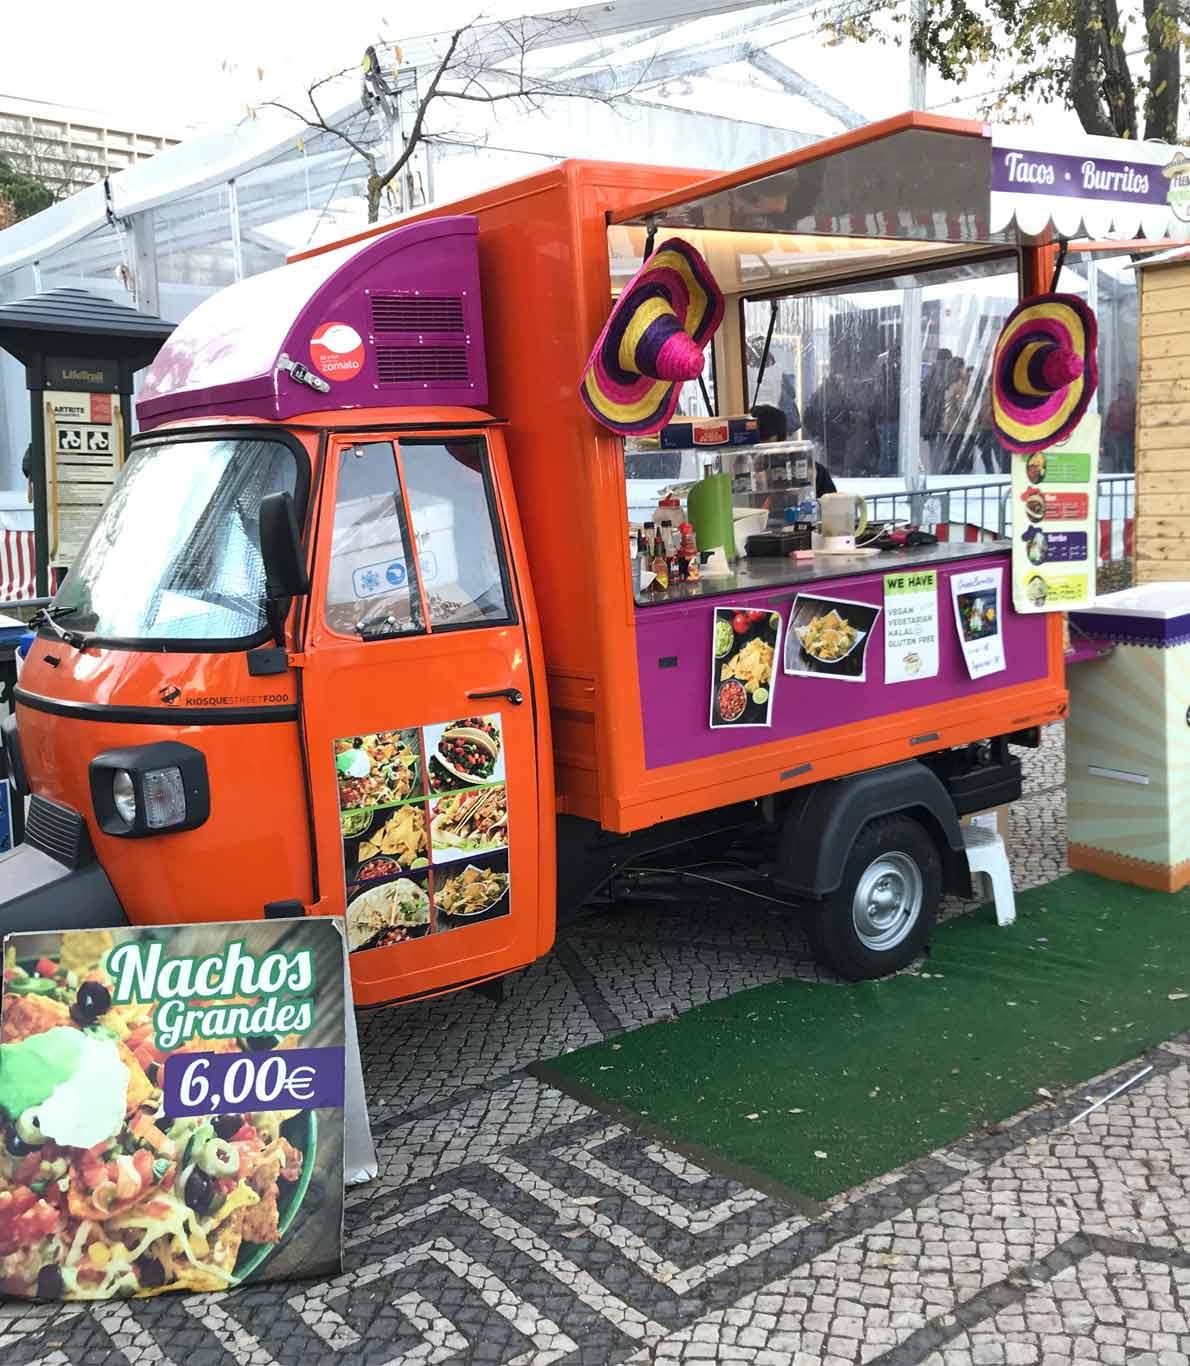 FoodTruck de comida mexicana que podemos encontra no Winter Wonderland de Lisboa.